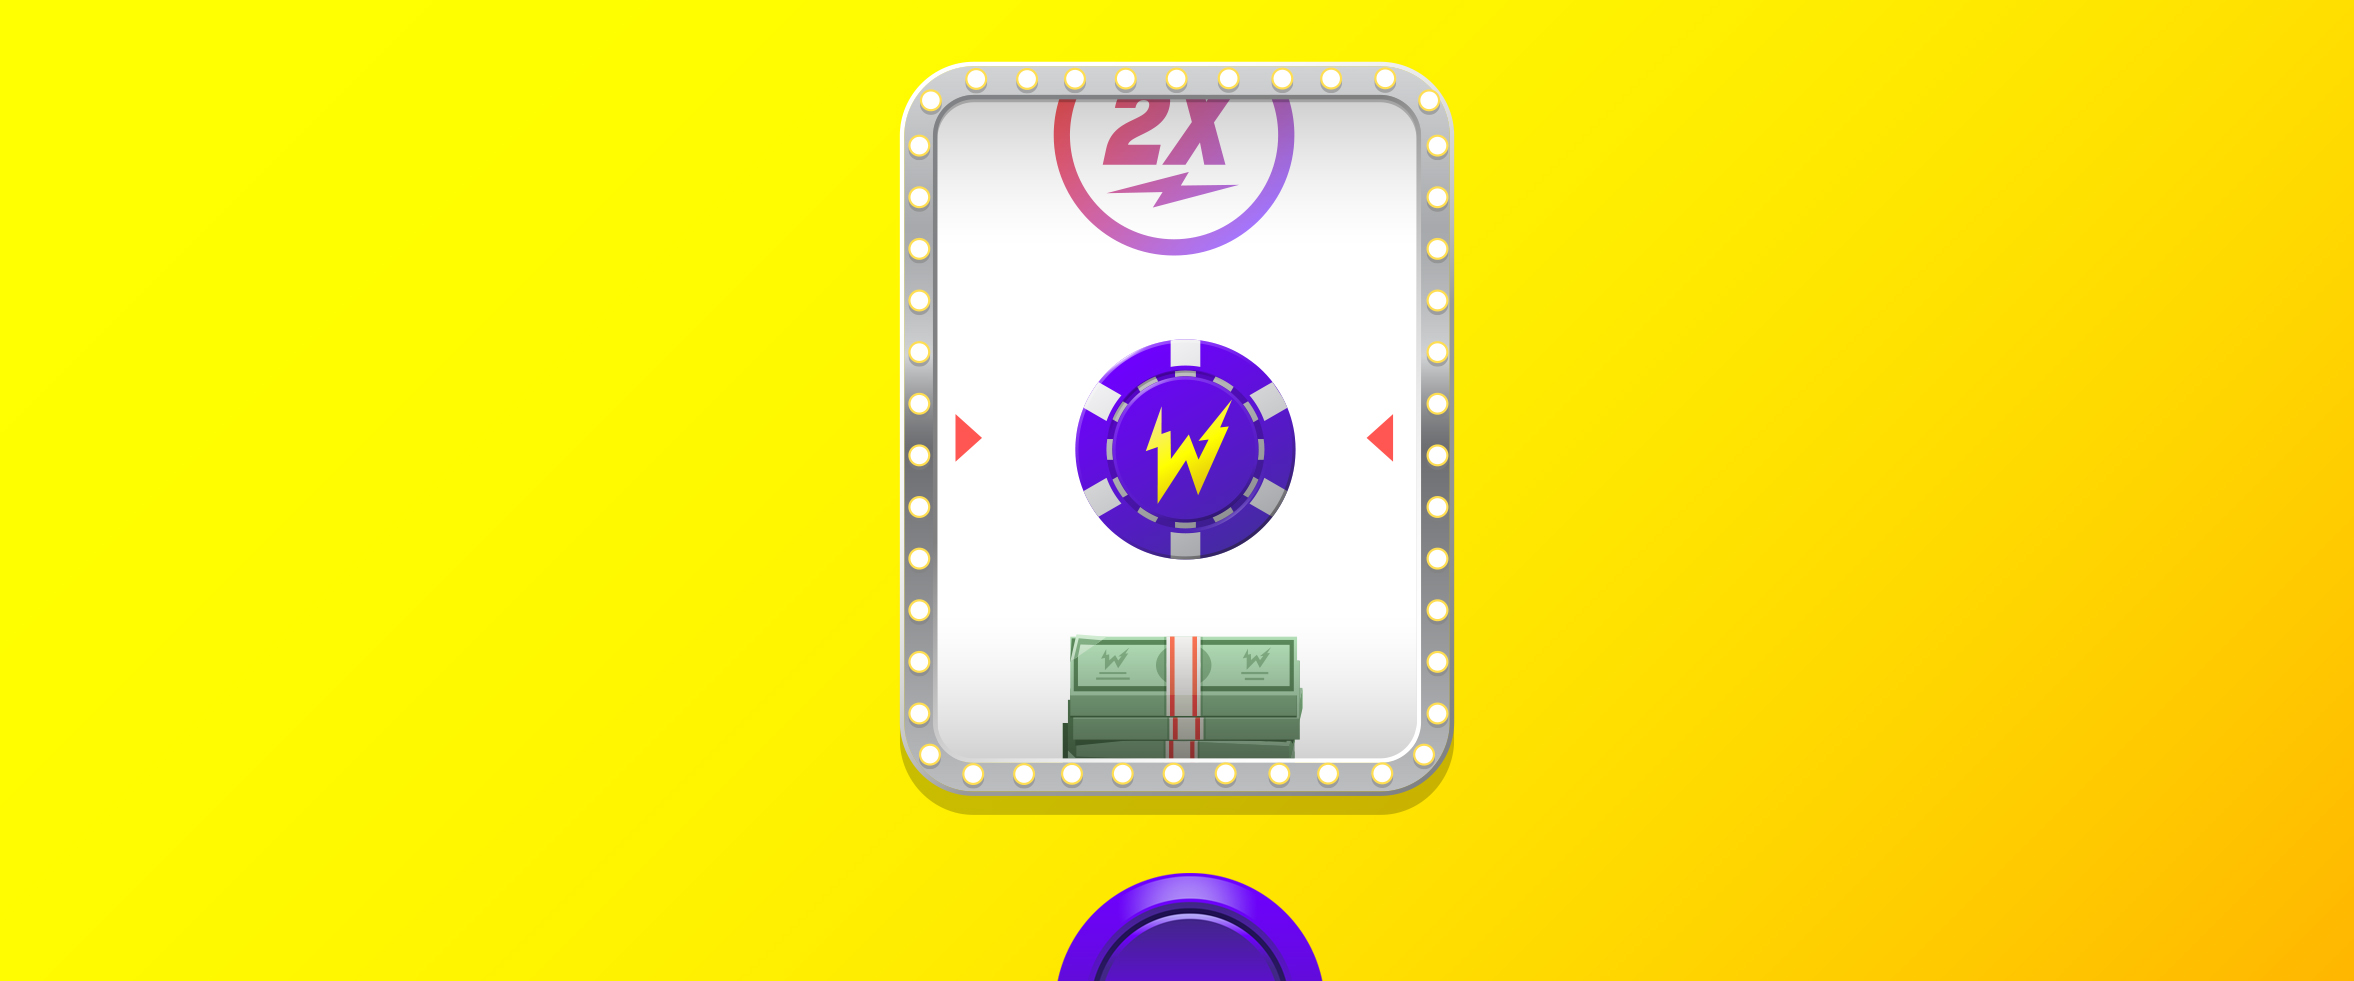 Introducing the Wildz rewards system